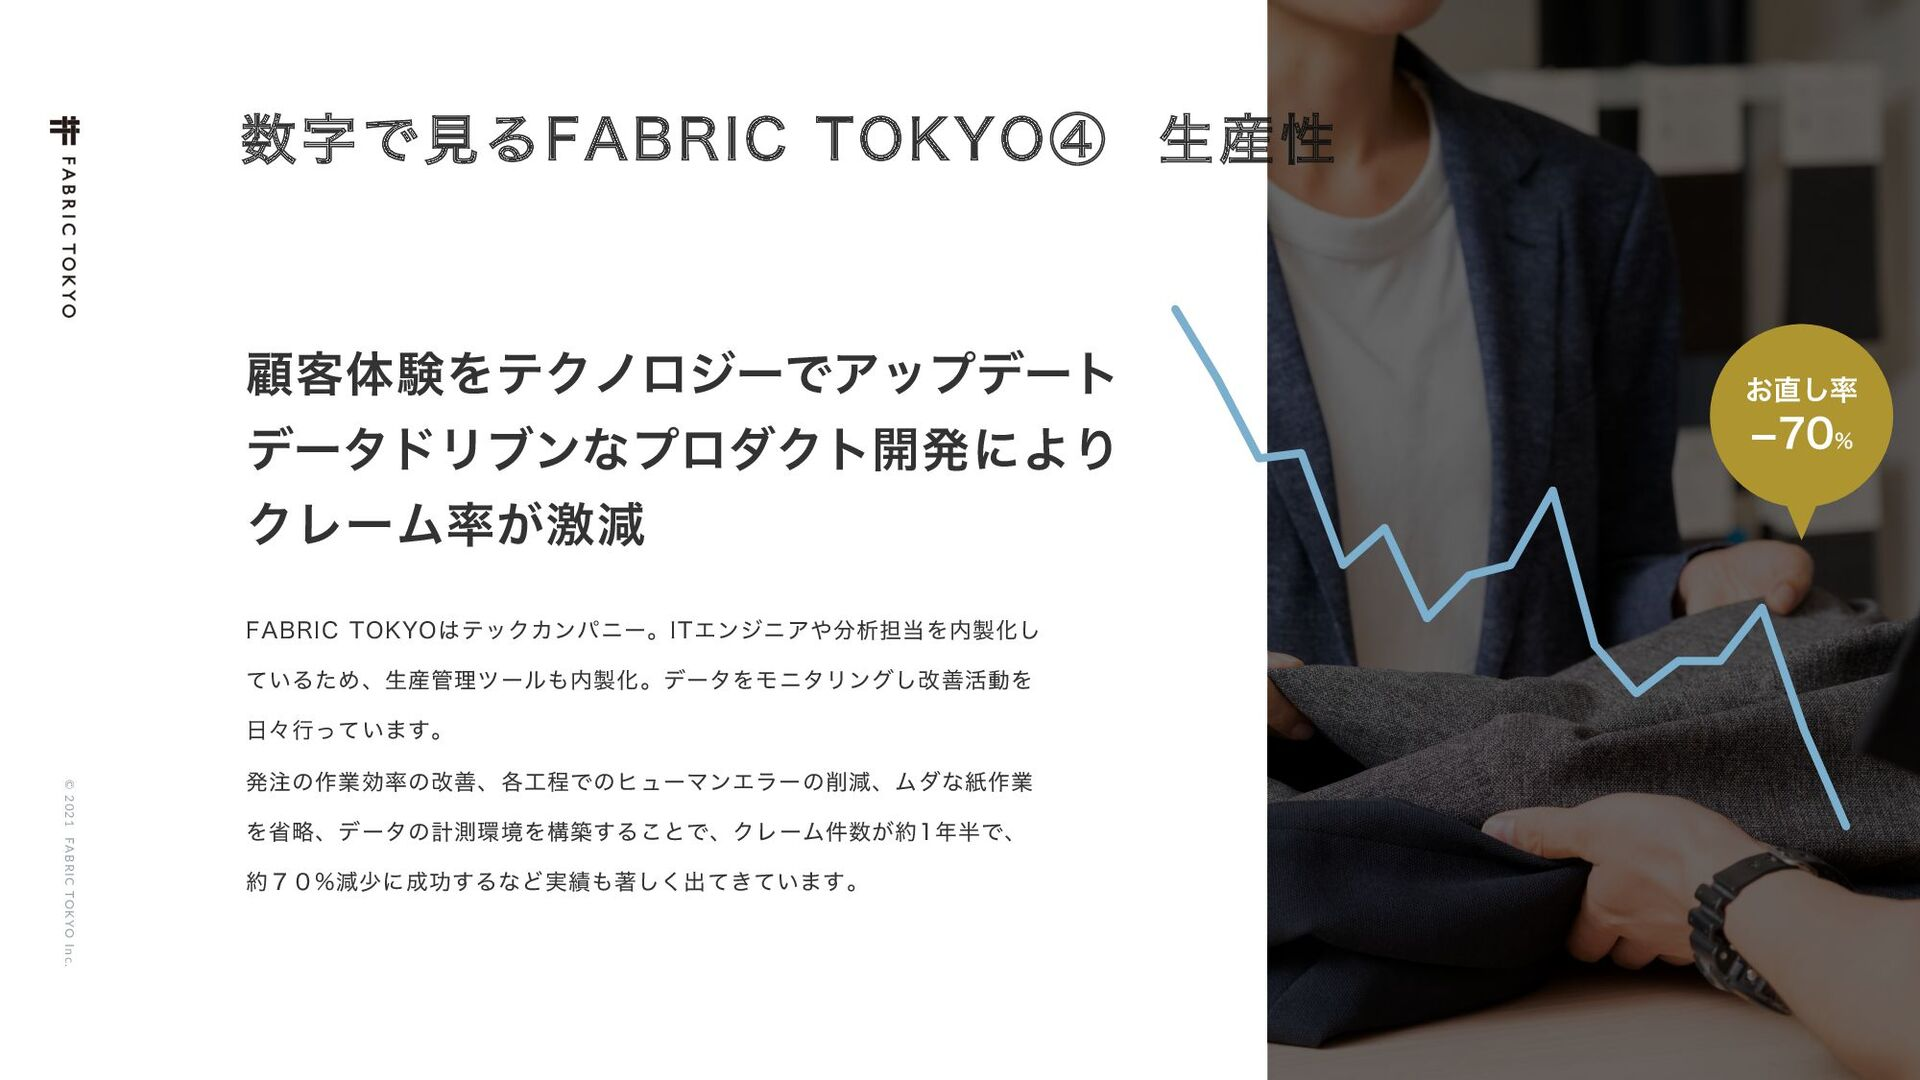 "© 2021 FABRIC TOKYO Inc. 22 ͰݟΔ'""#3*$ 50,:0ᶆ ..."